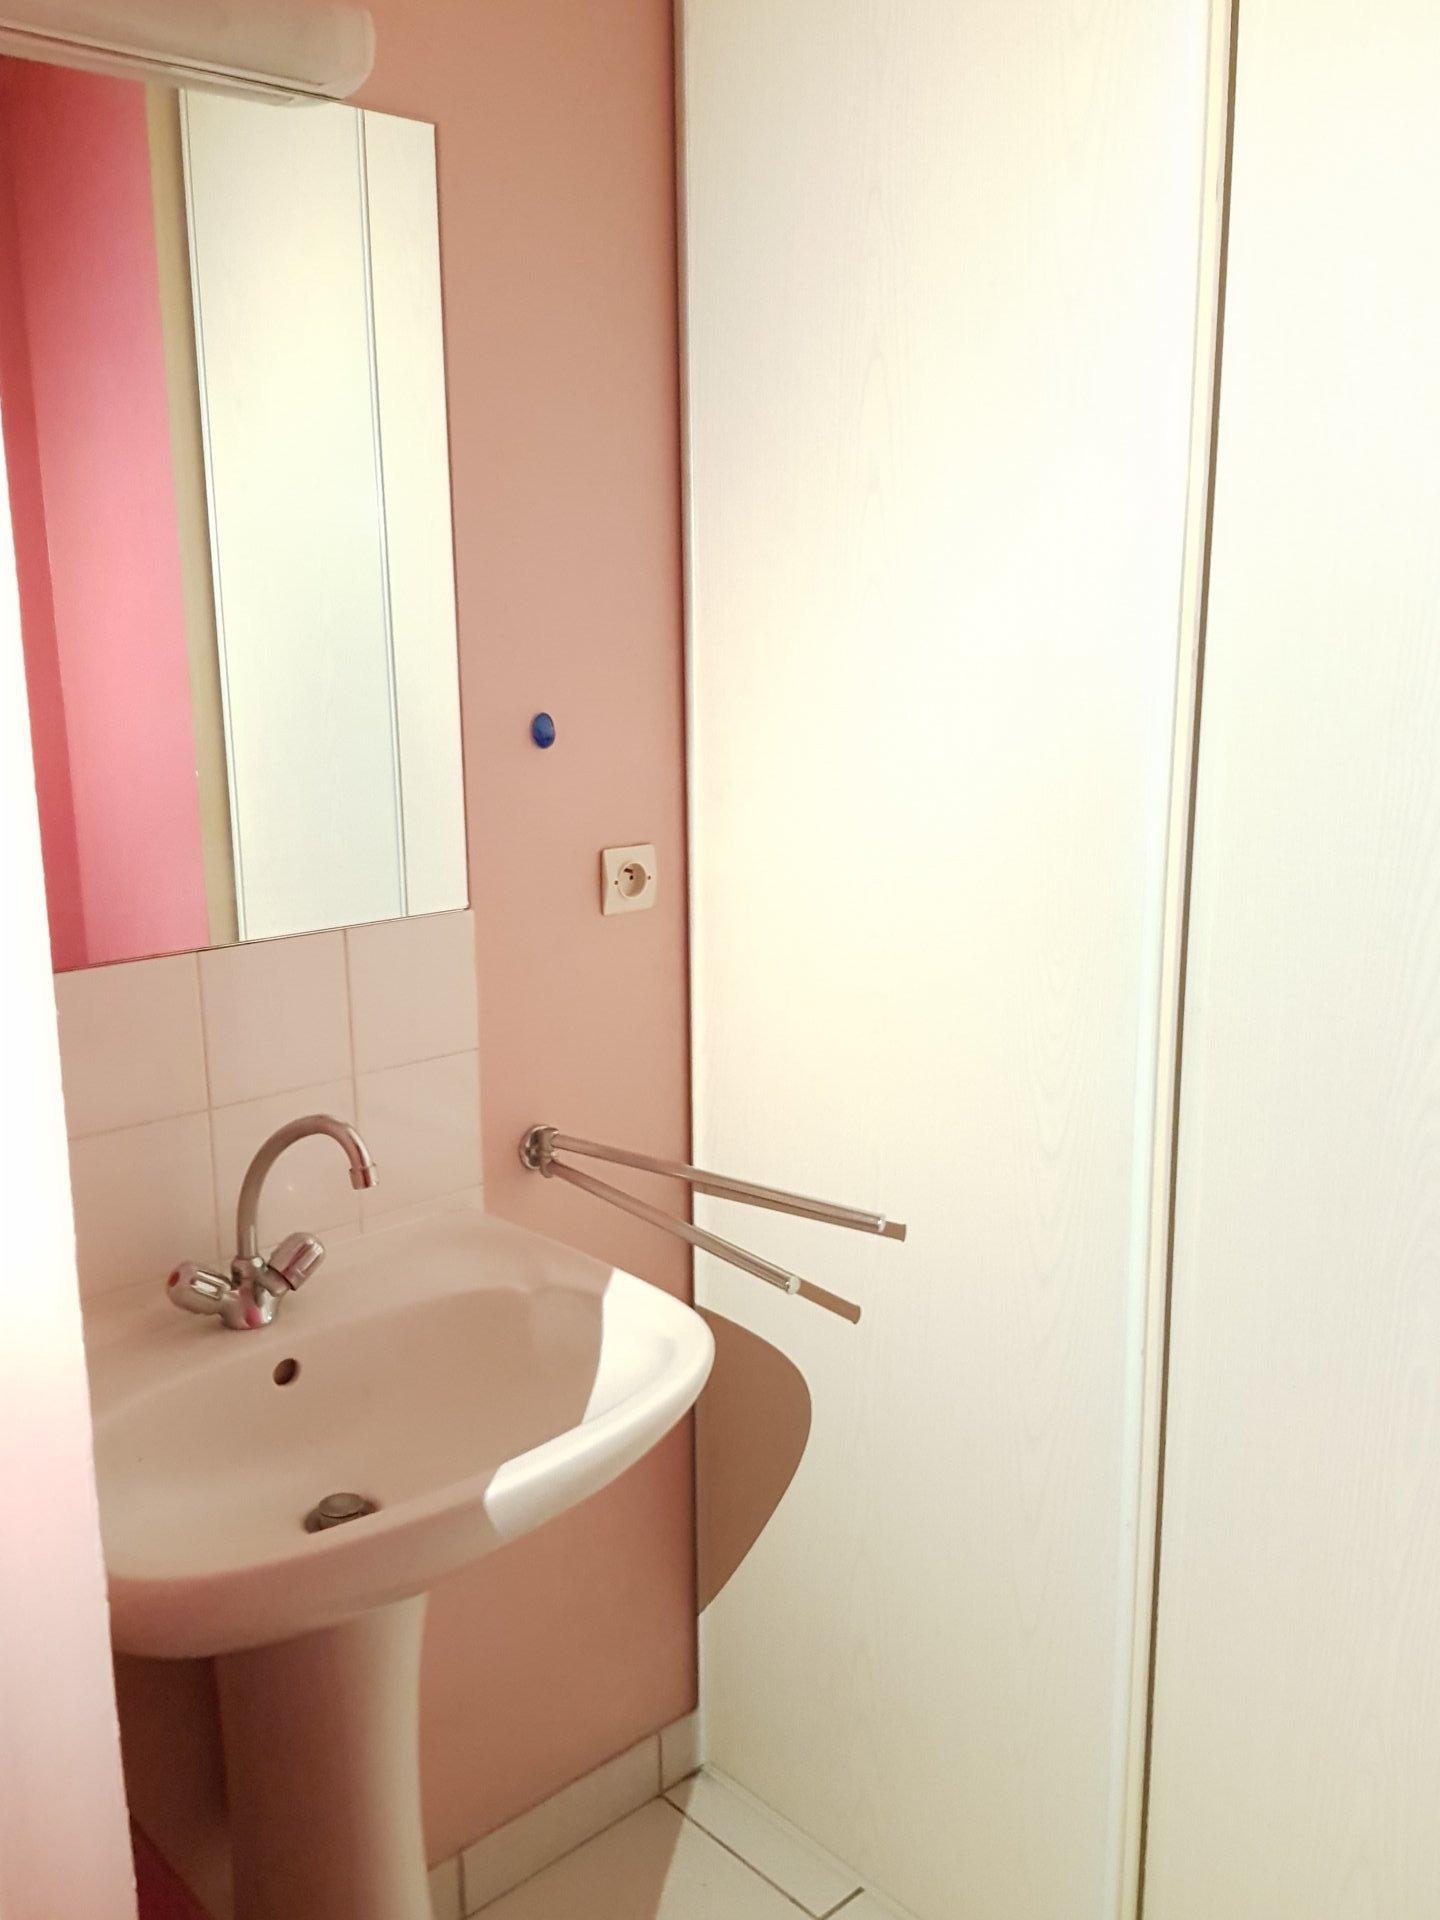 Rental Apartment   Perpignan. Bedroom. Bathroom. Bathroom, Tile. Bathroom